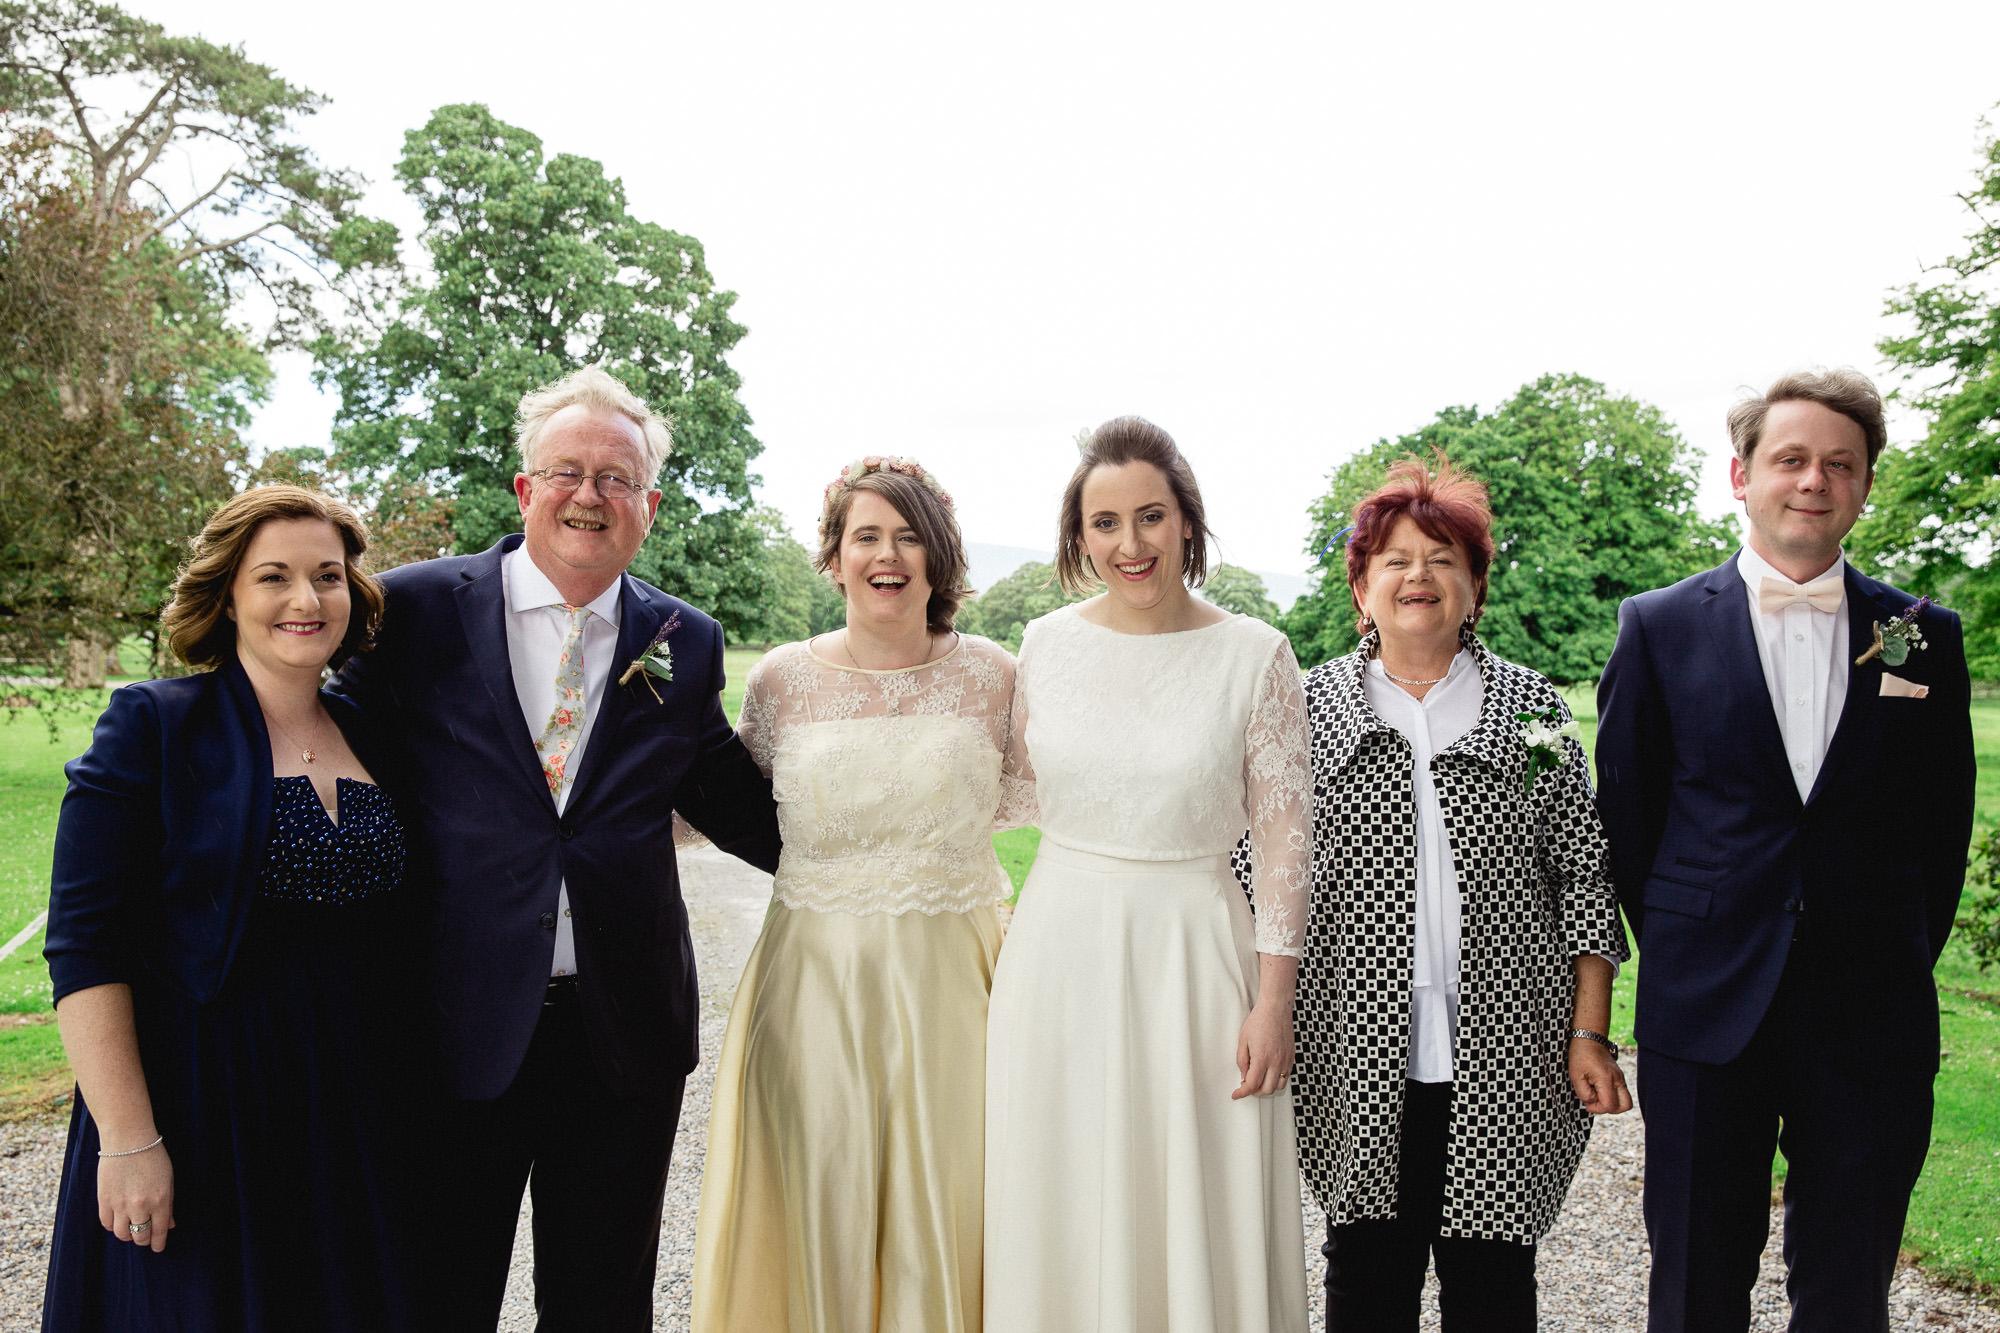 CLAIREBYRNEPHOTOGRAPHY-WEDDING-Ireland-cloncody-alternative-fun-Jen-Helena-8.jpg